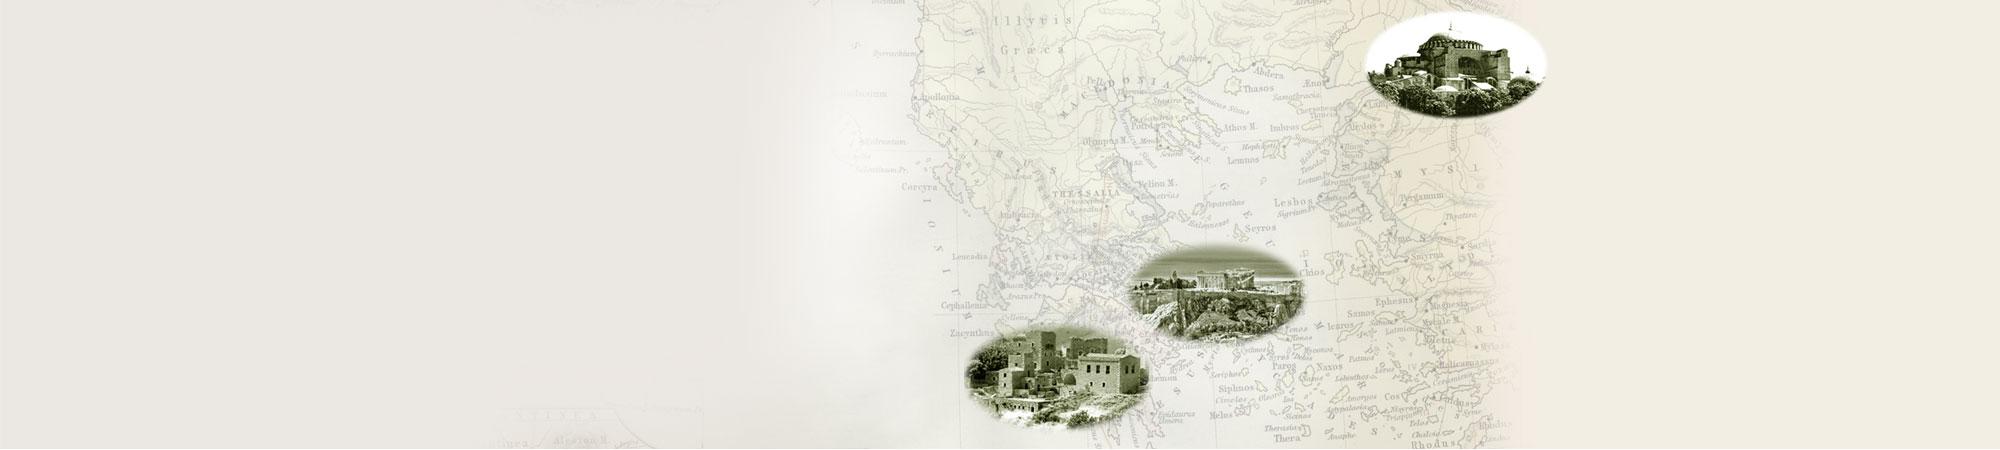 slide 1 ancient background, σιροπιαστά γλυκά Ανατολής